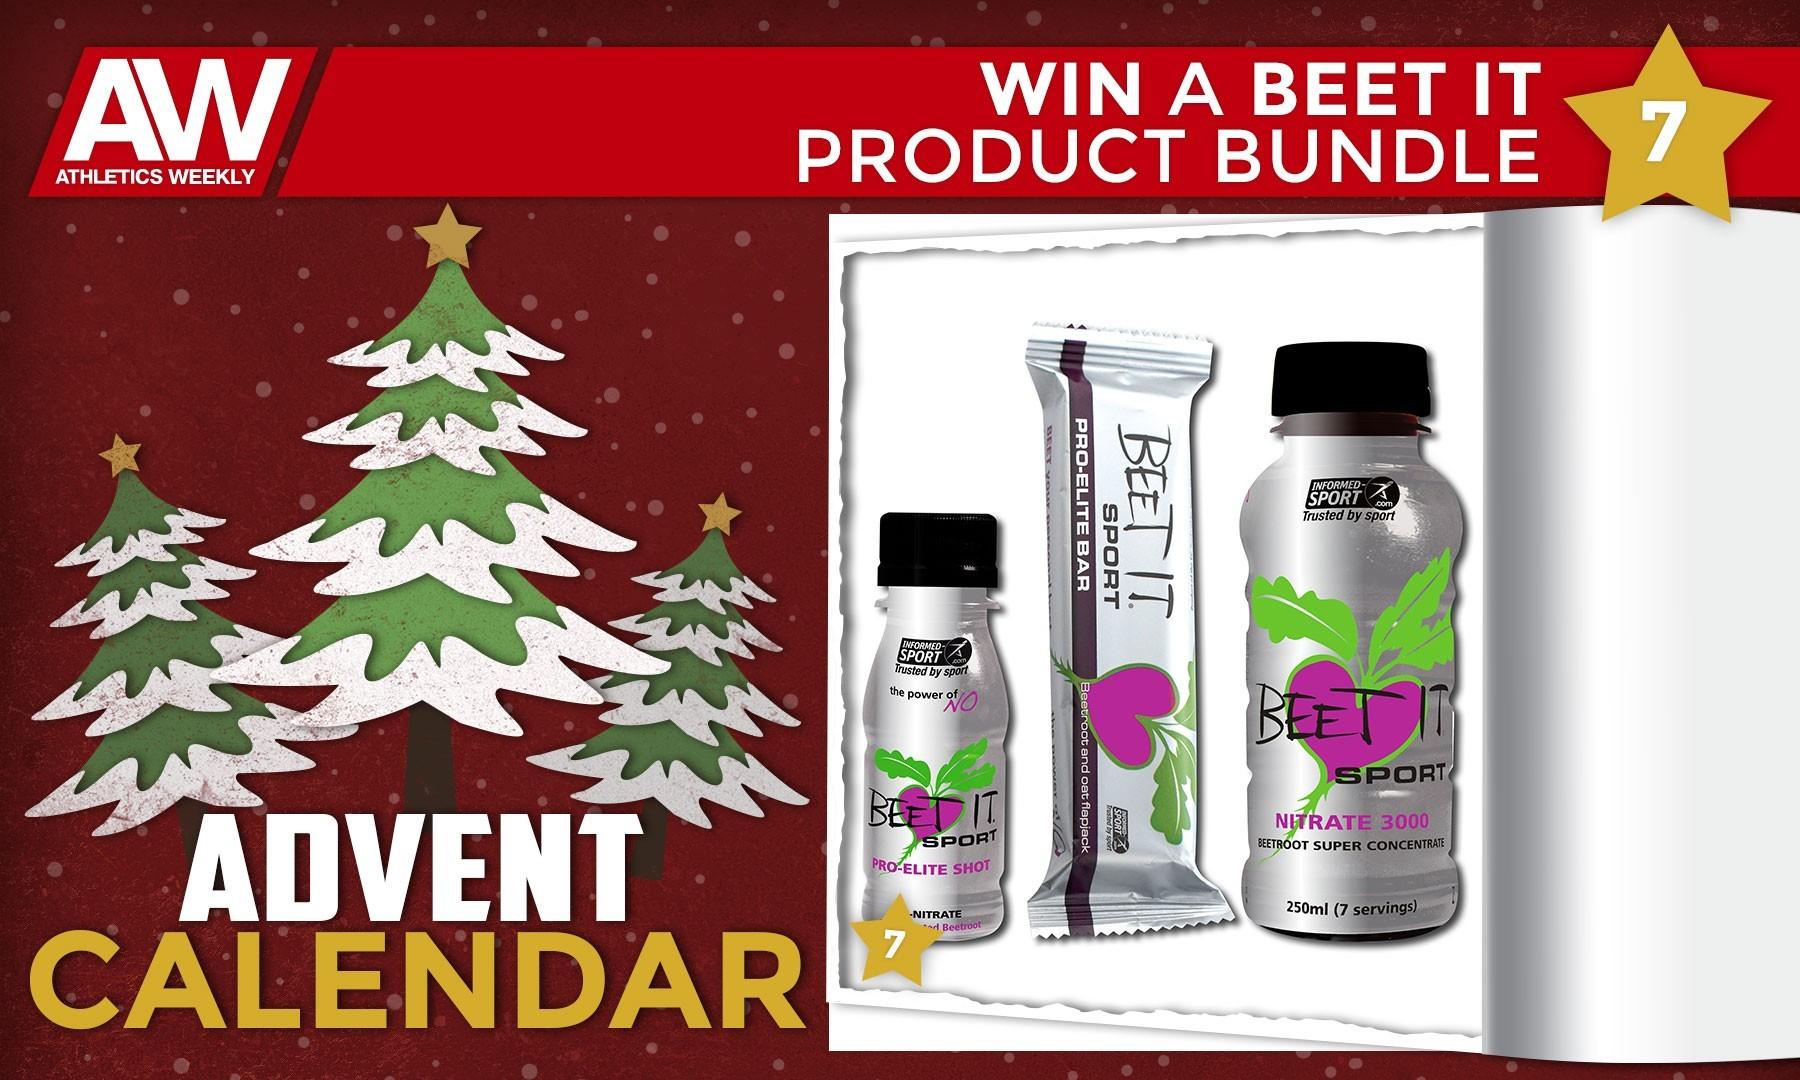 Win a Beet It product bundle